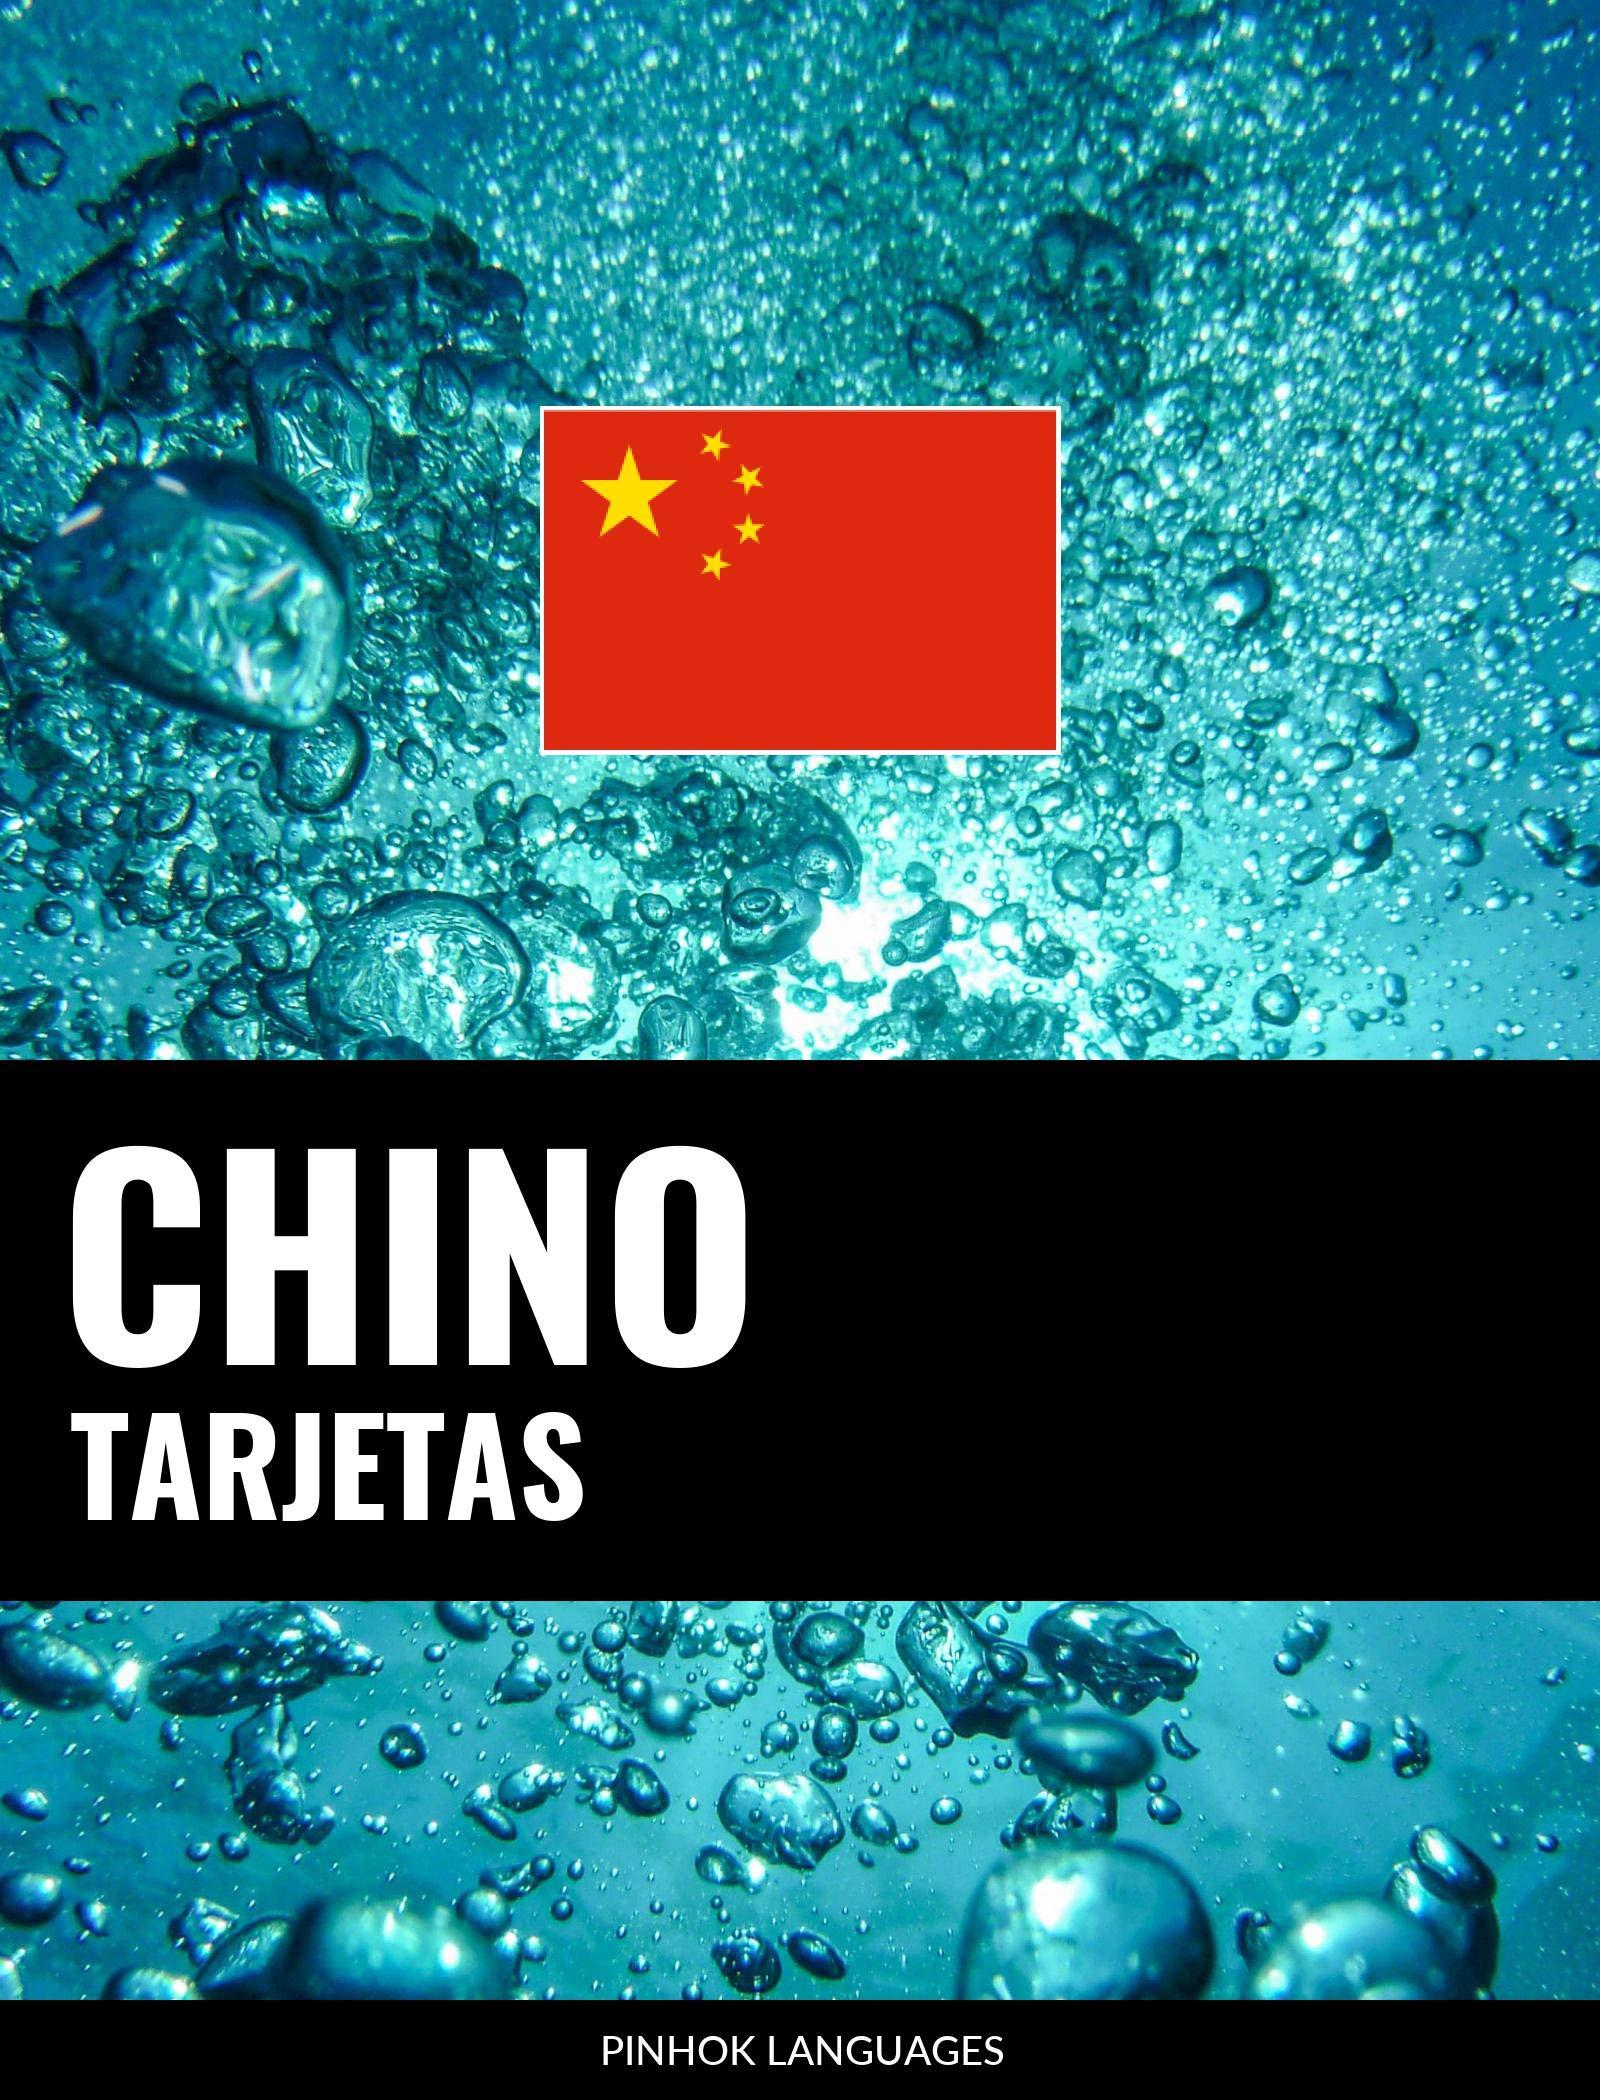 Tarjetas en chino: 800 tarjetas importantes chino-español y español-chino